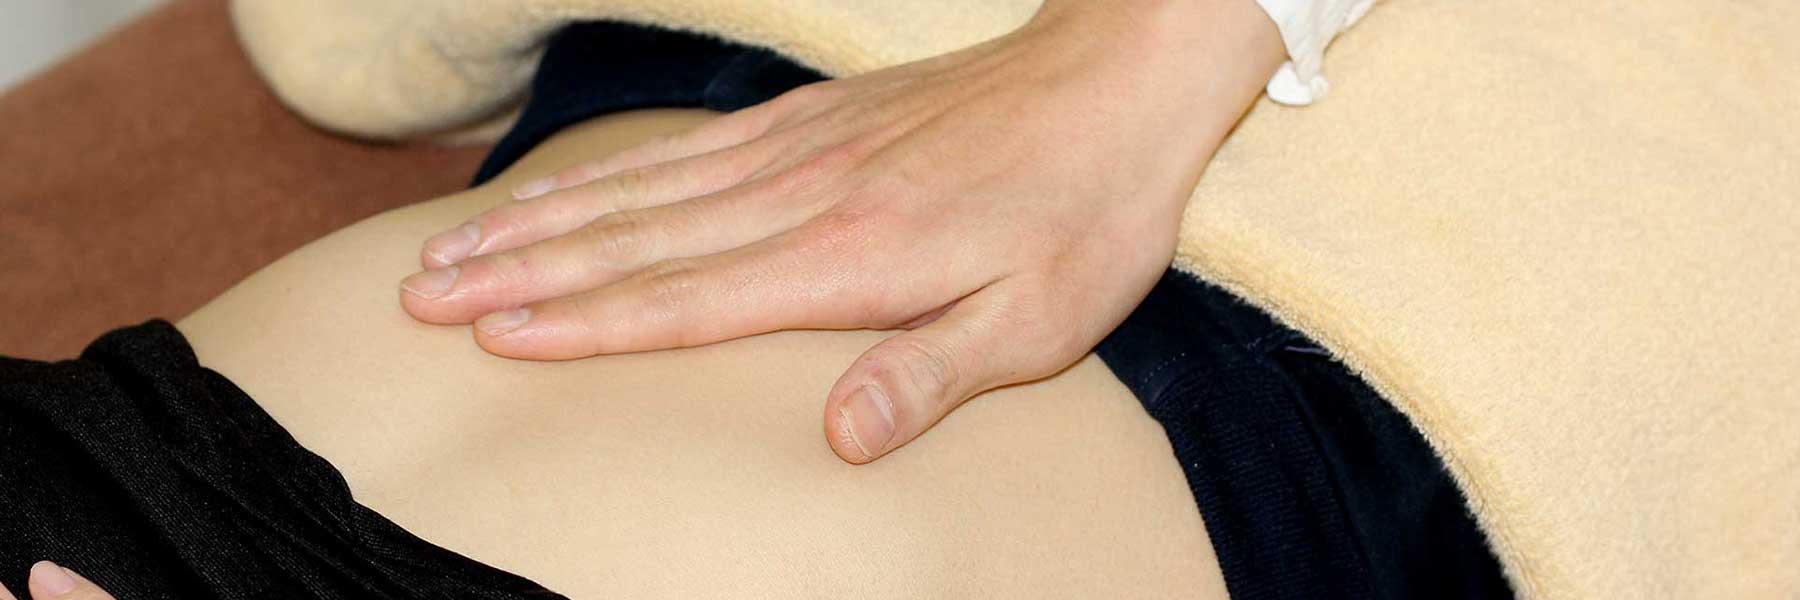 初診時の流れ | 鍼灸薫風堂 | 名古屋市瑞穂区の鍼灸治療院